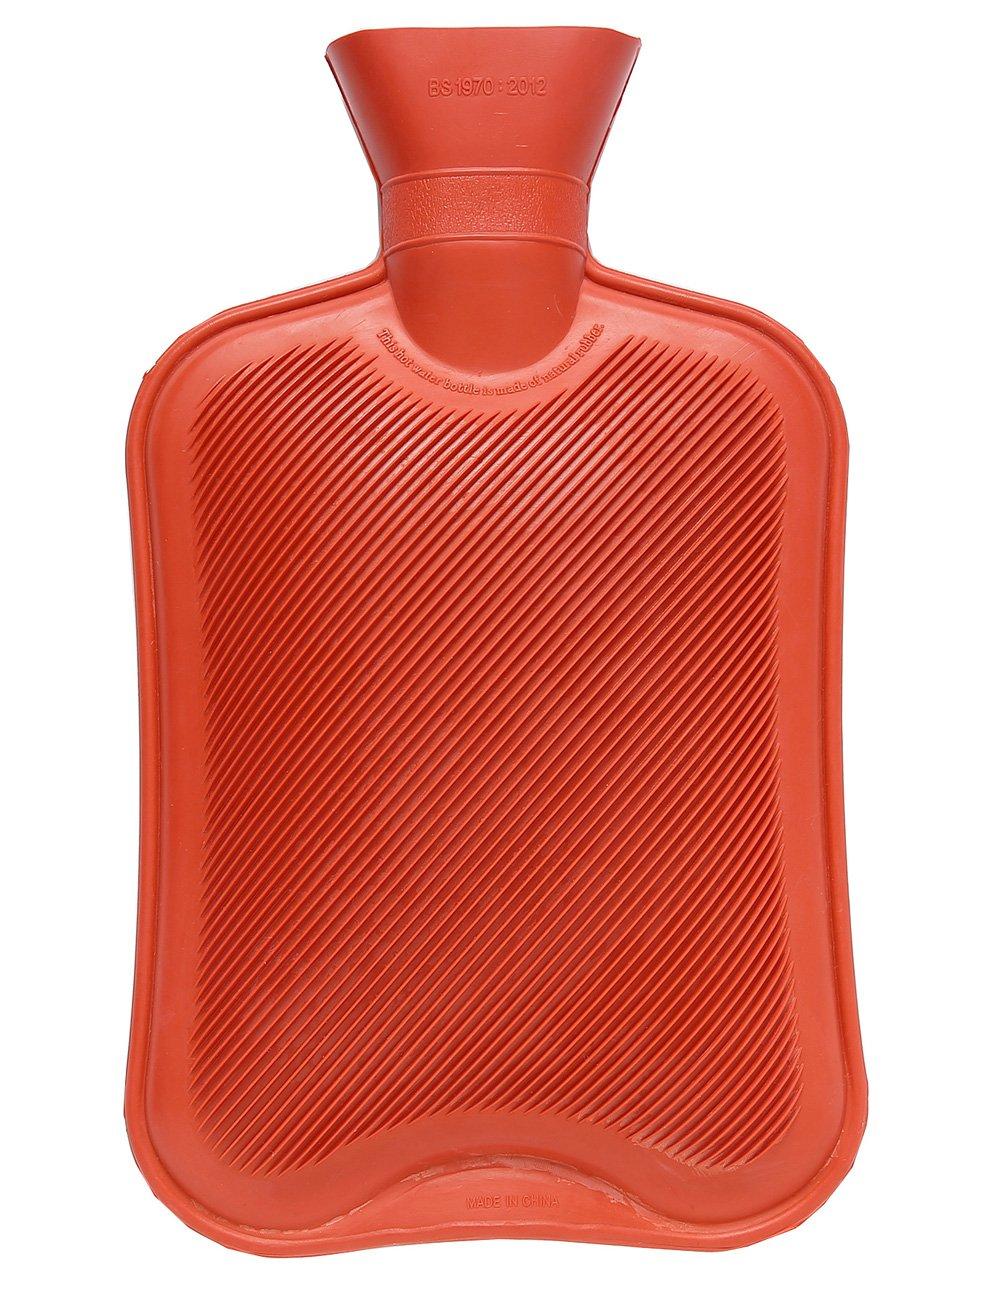 HomeIdeas 2 Liter Full Size Natural Rubber Multifunctional Safe Hot Water Bottle (Red)